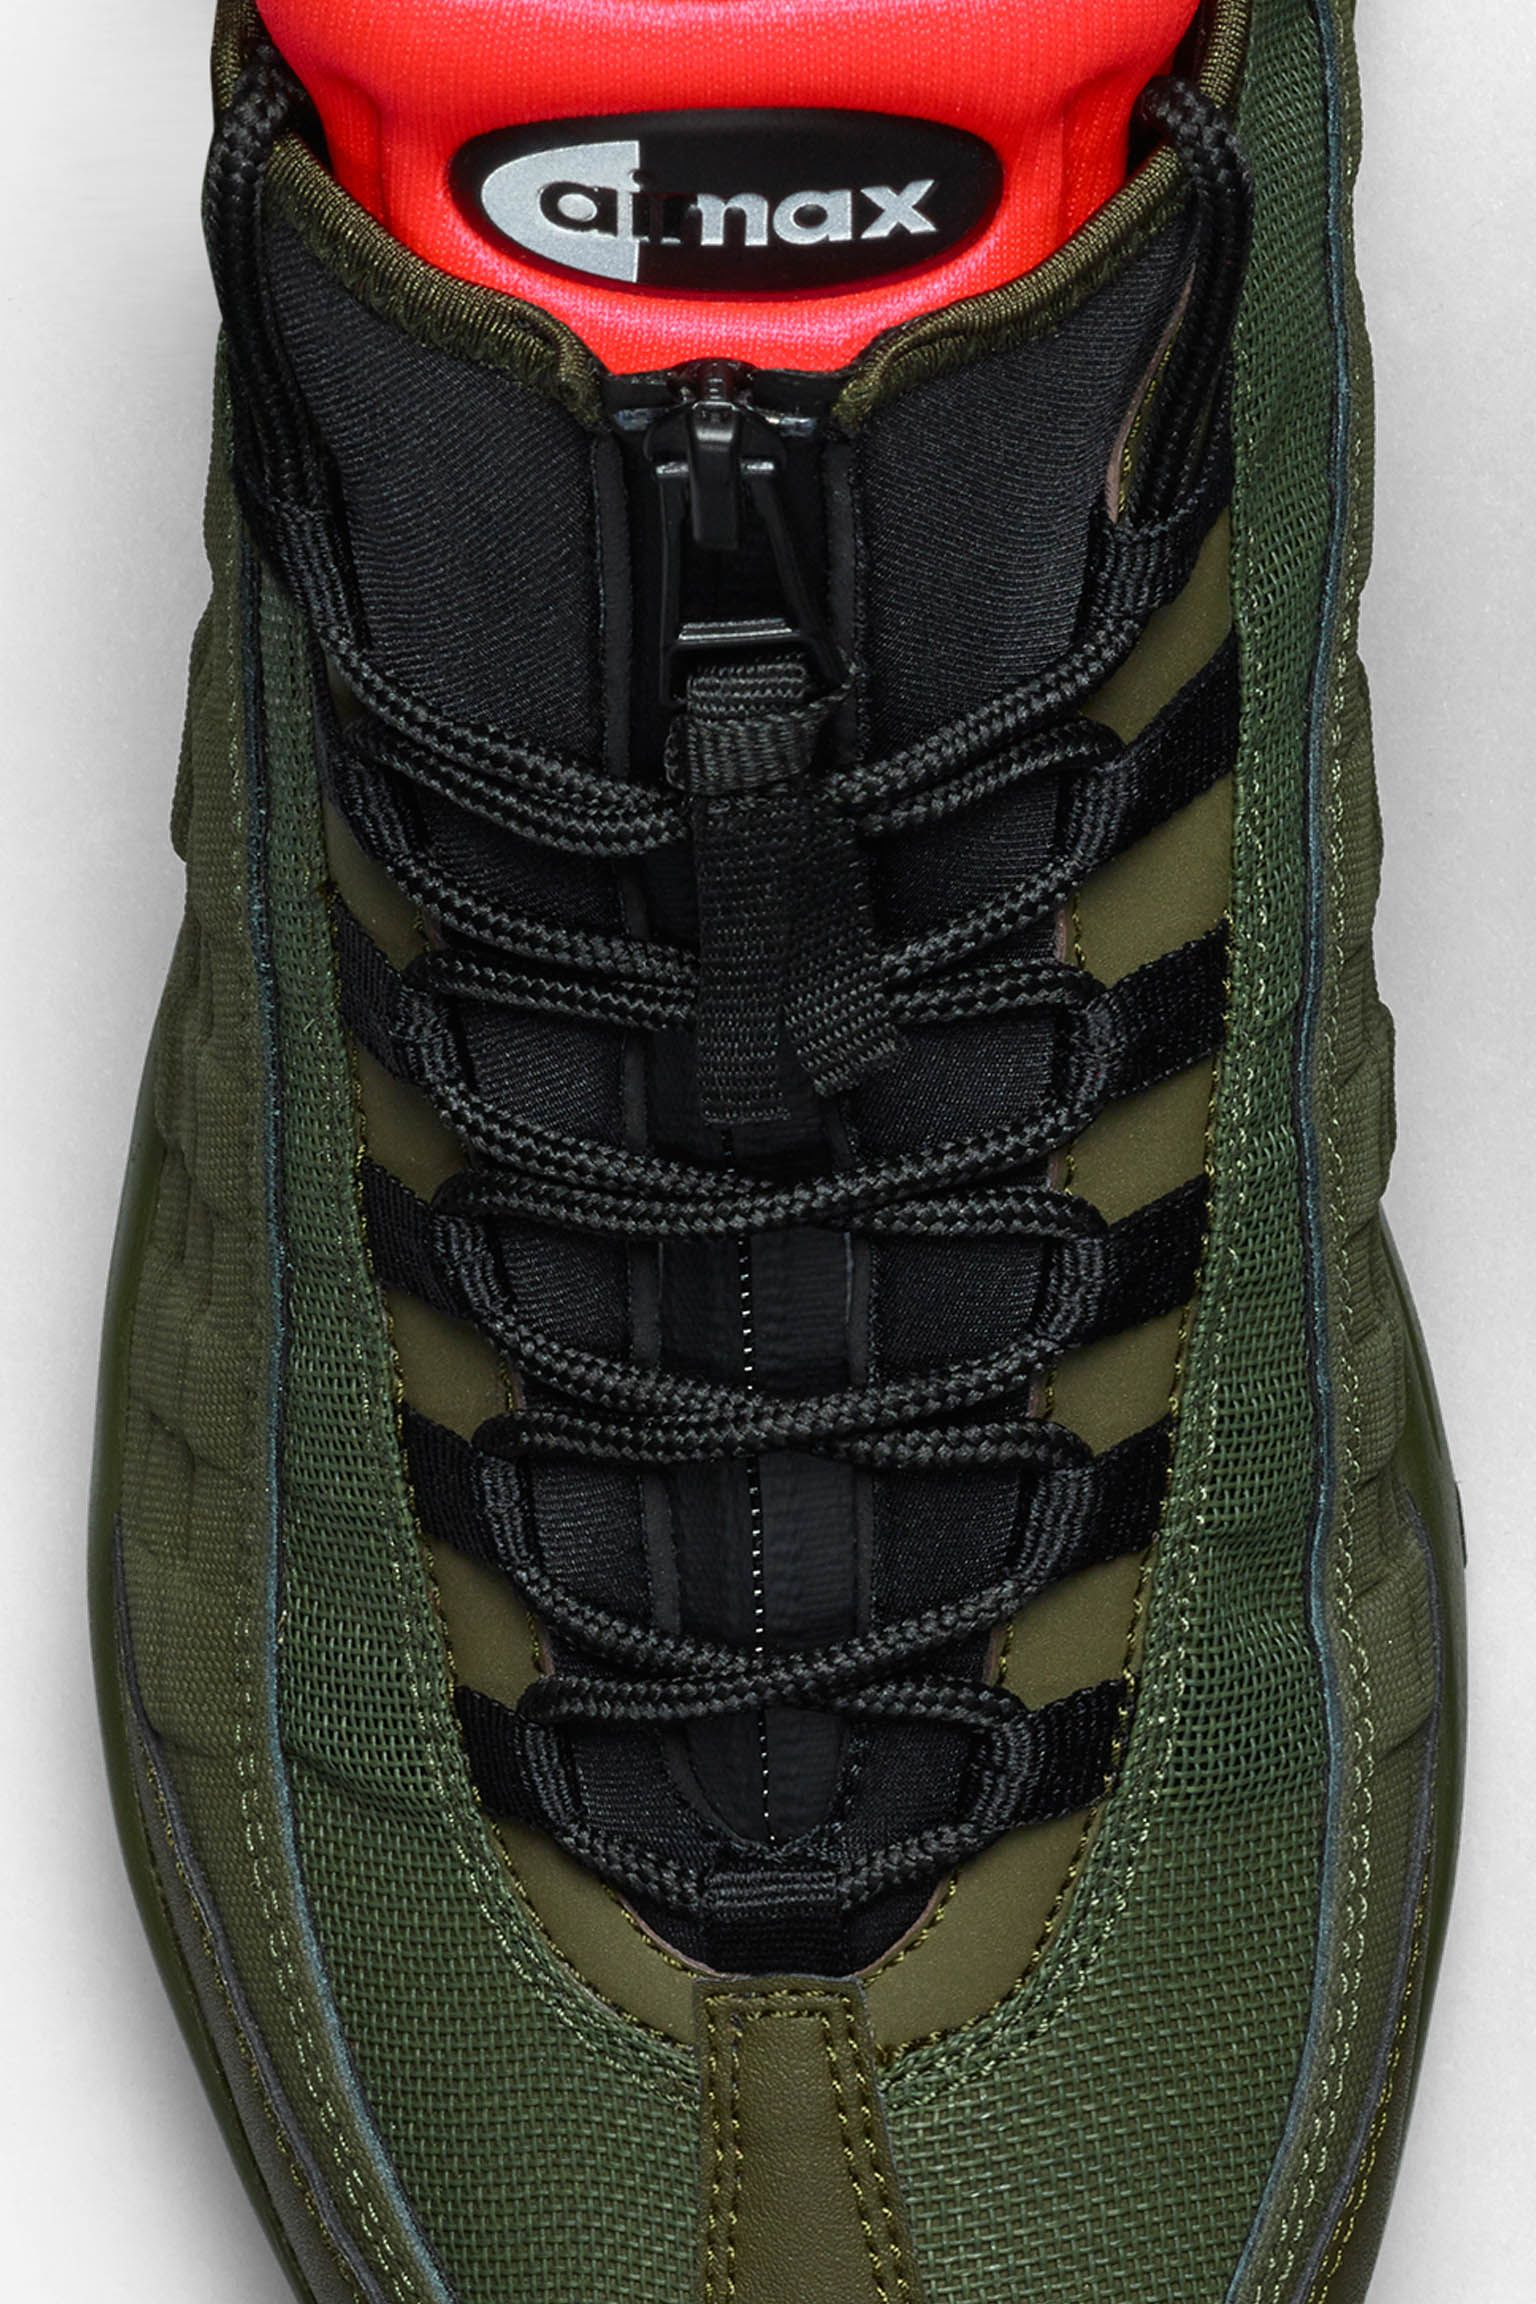 Nike Air Max 95 SneakerBoot 'Dark Loden & Cargo Khaki'